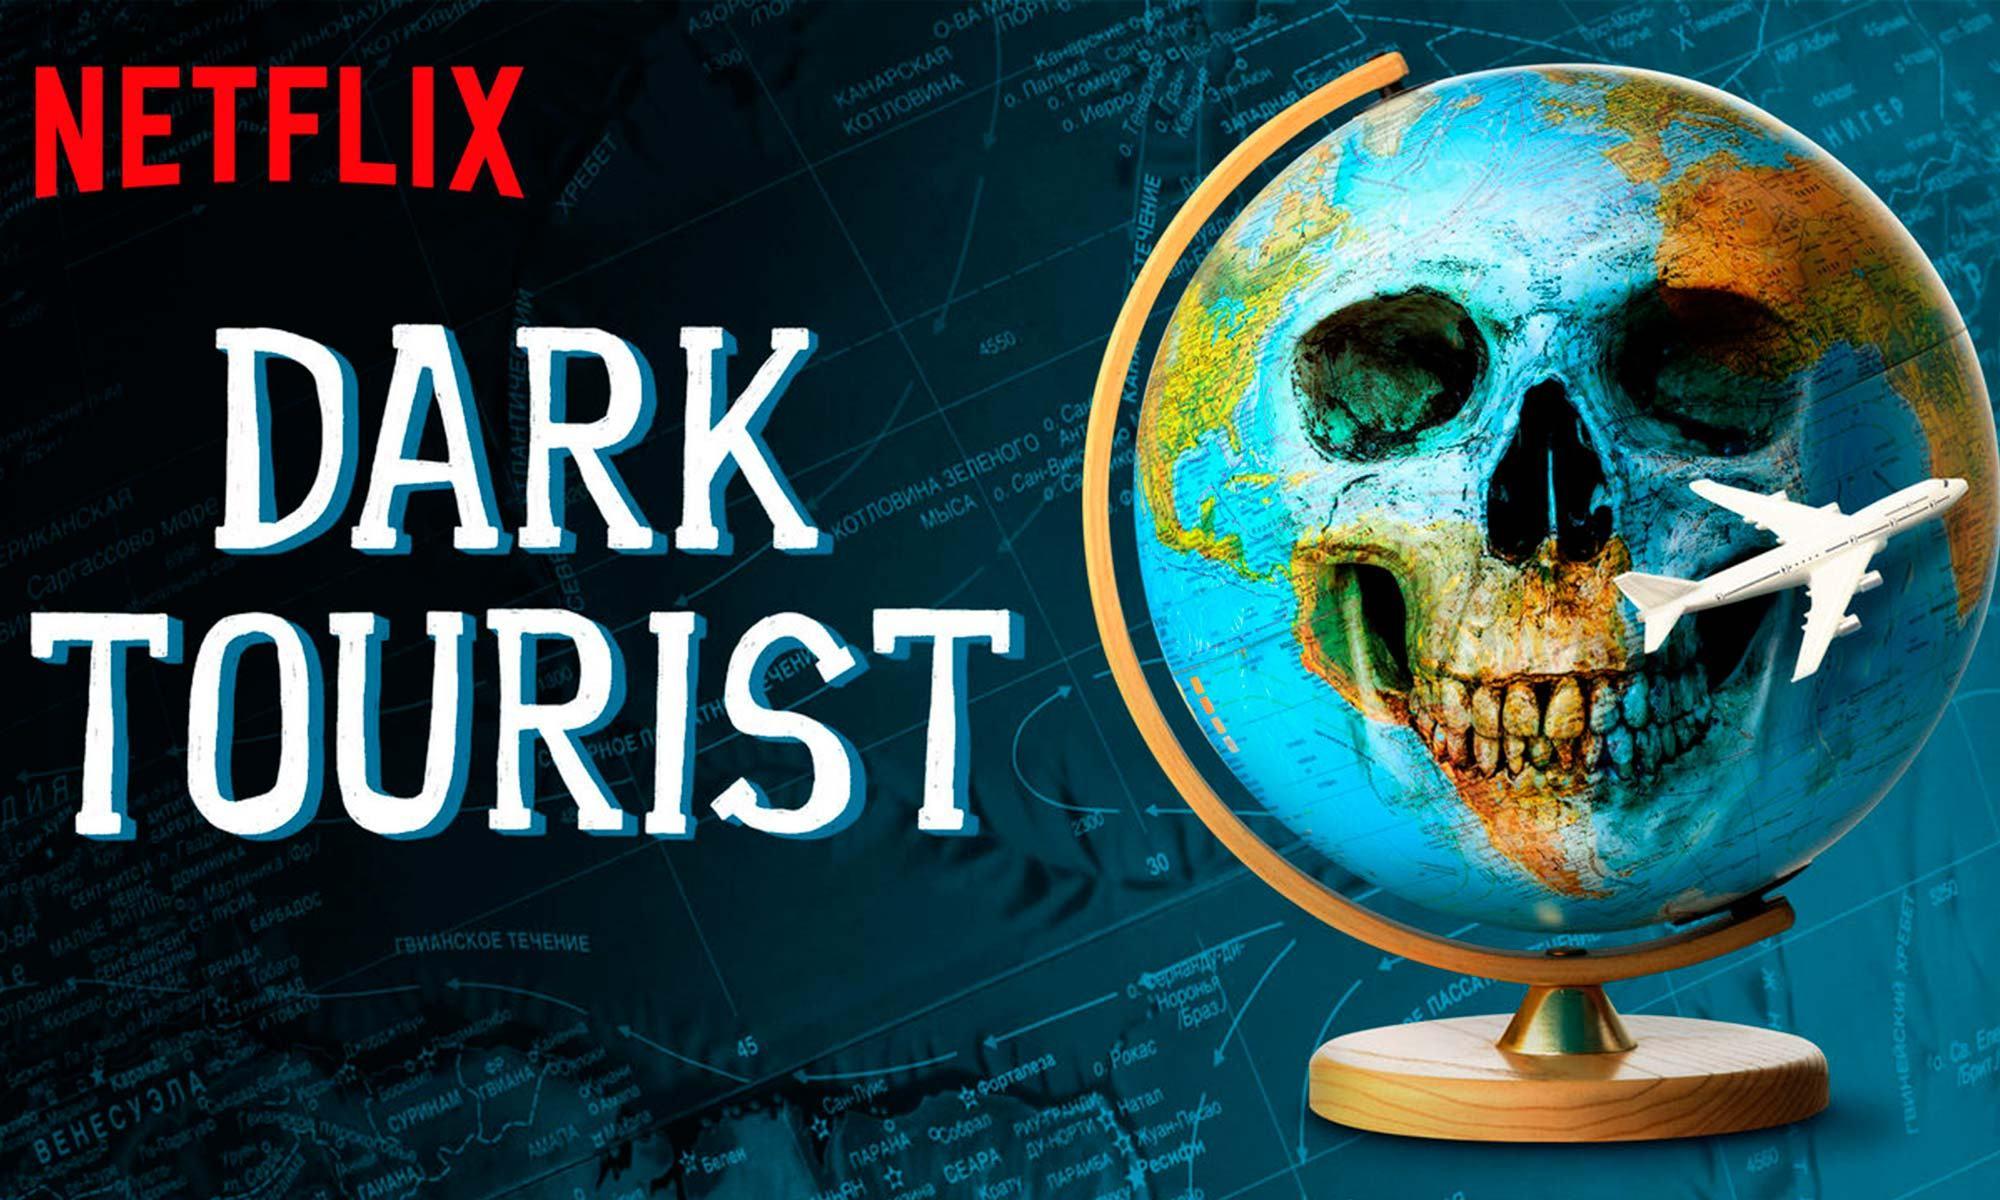 Análisis de la serie Dark Tourist